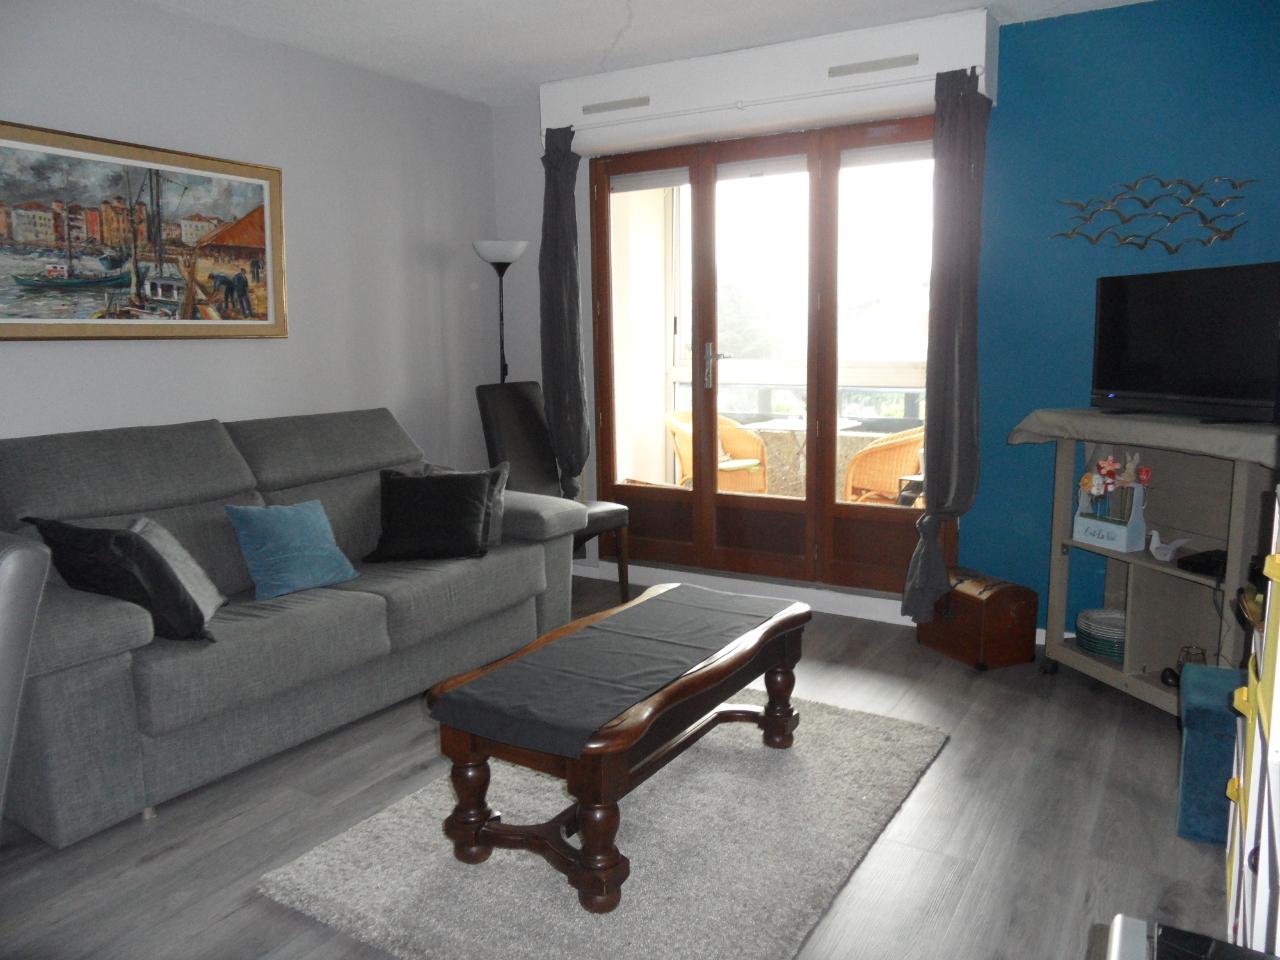 vente appartement à HENDAYE - 279 900